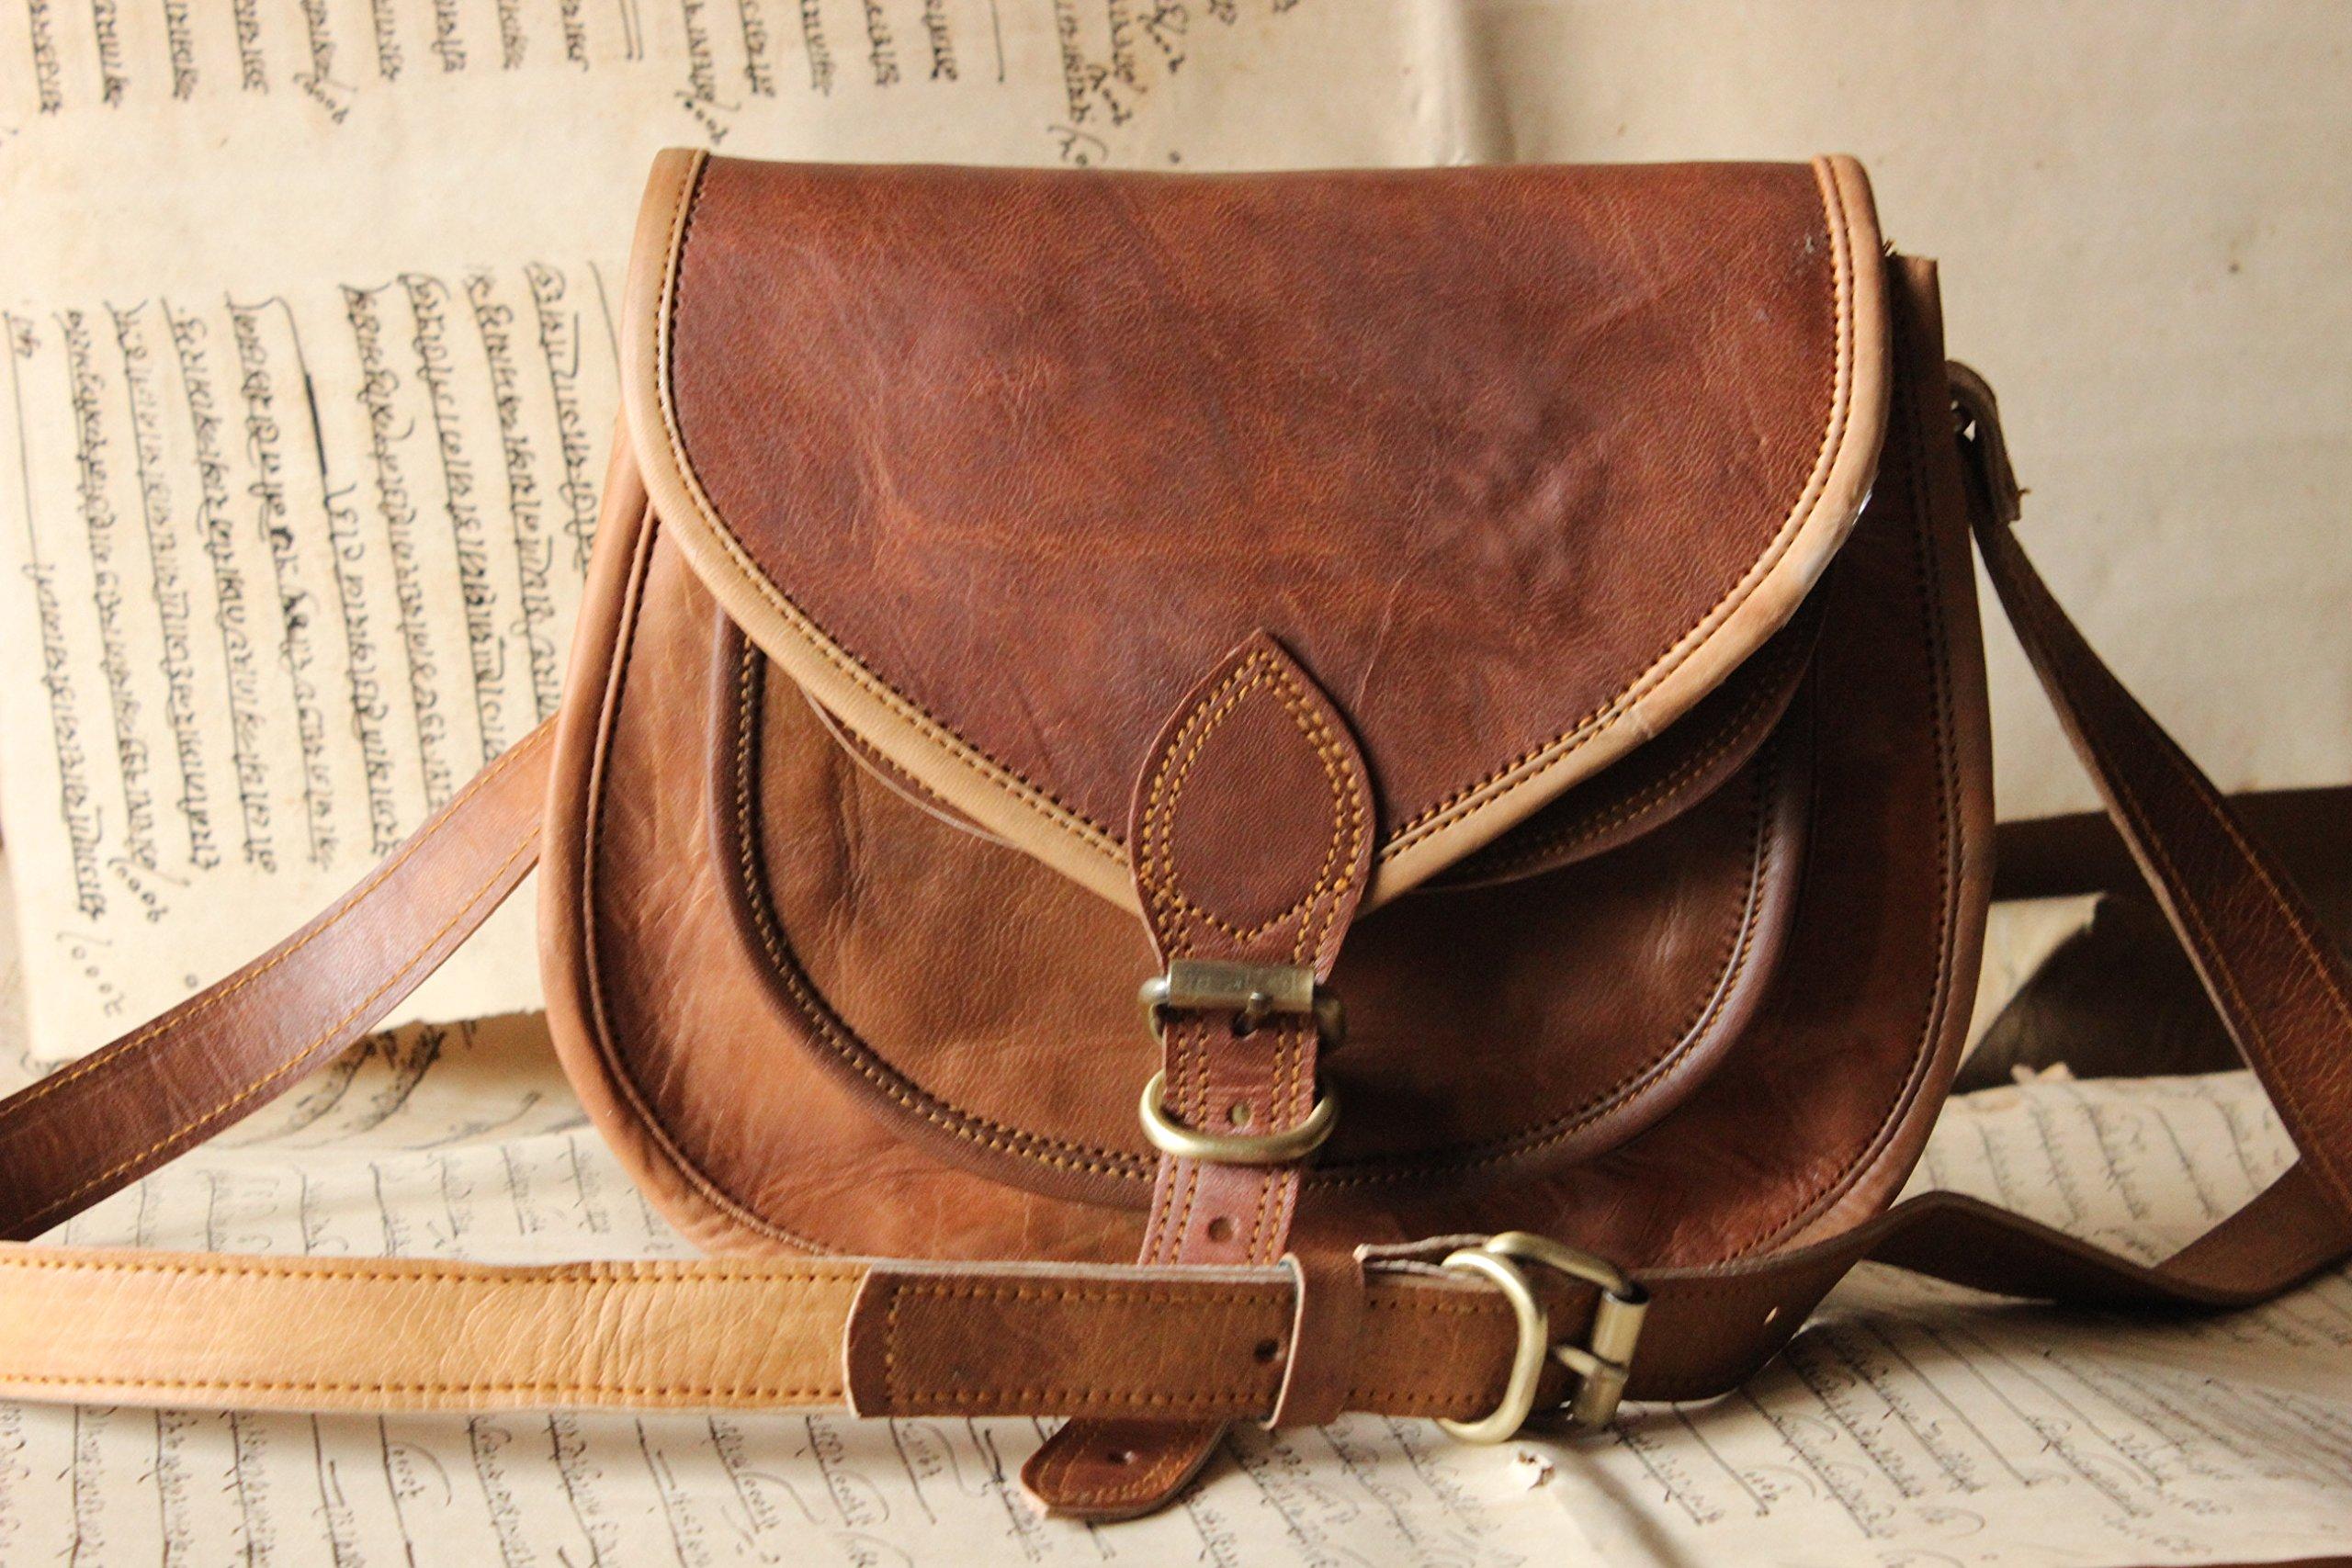 Handmade Craft 9'' X 7'' Brown ,Genuine Leather Women's Bag /Handbag / Tote/purse/ Shopping Bag